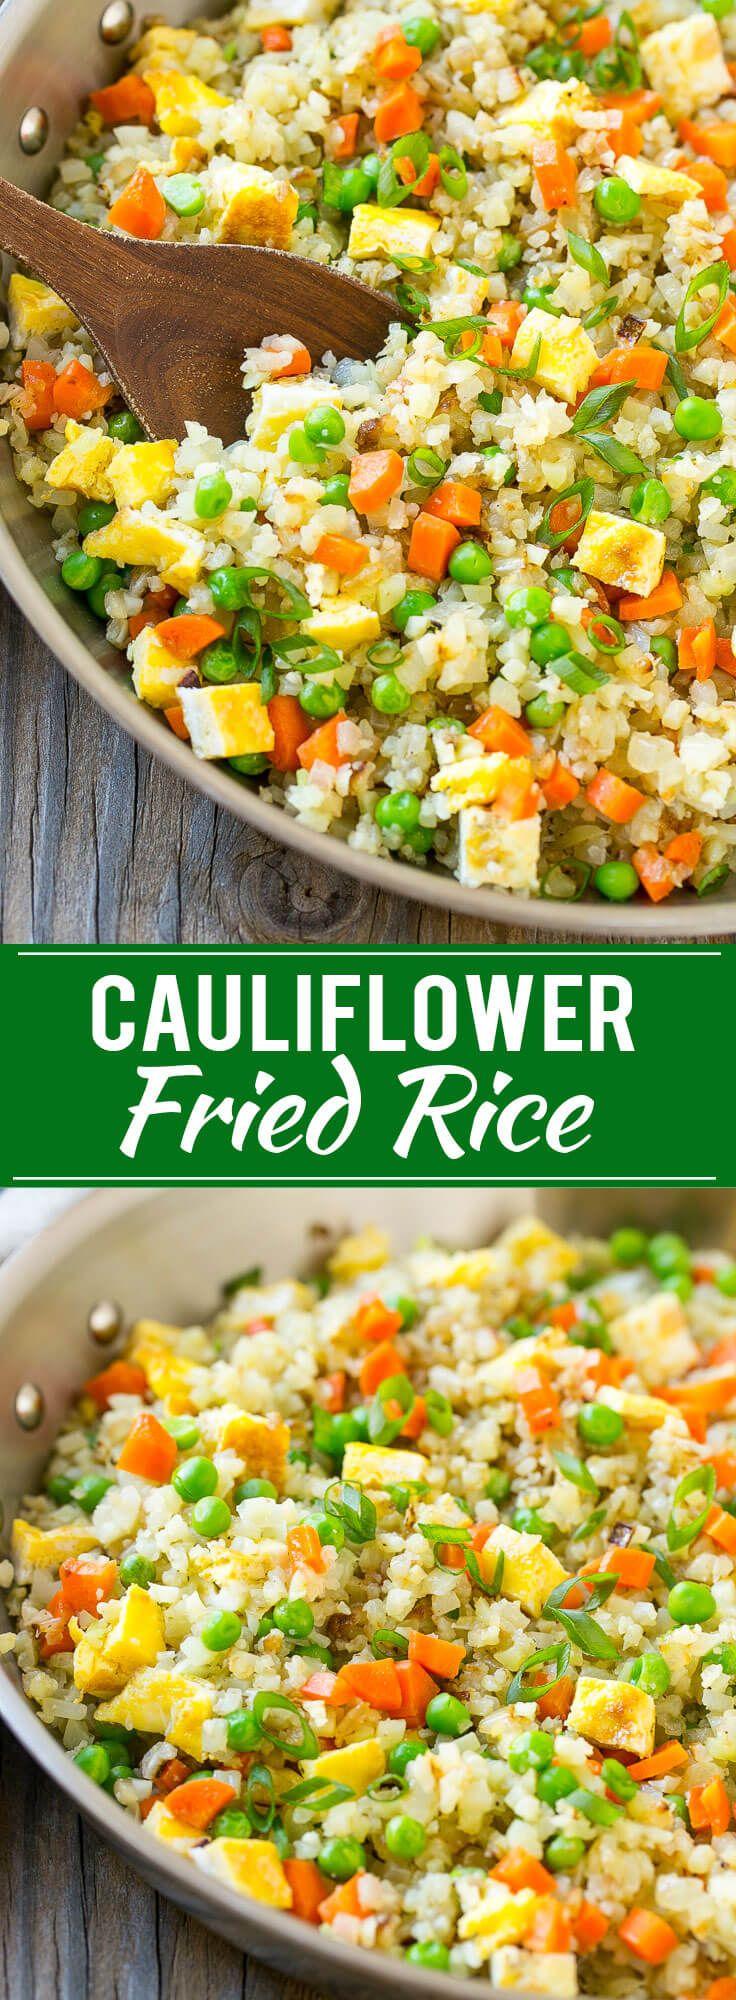 Cauliflower Fried Rice Cauliflower Rice Low Carb Rice